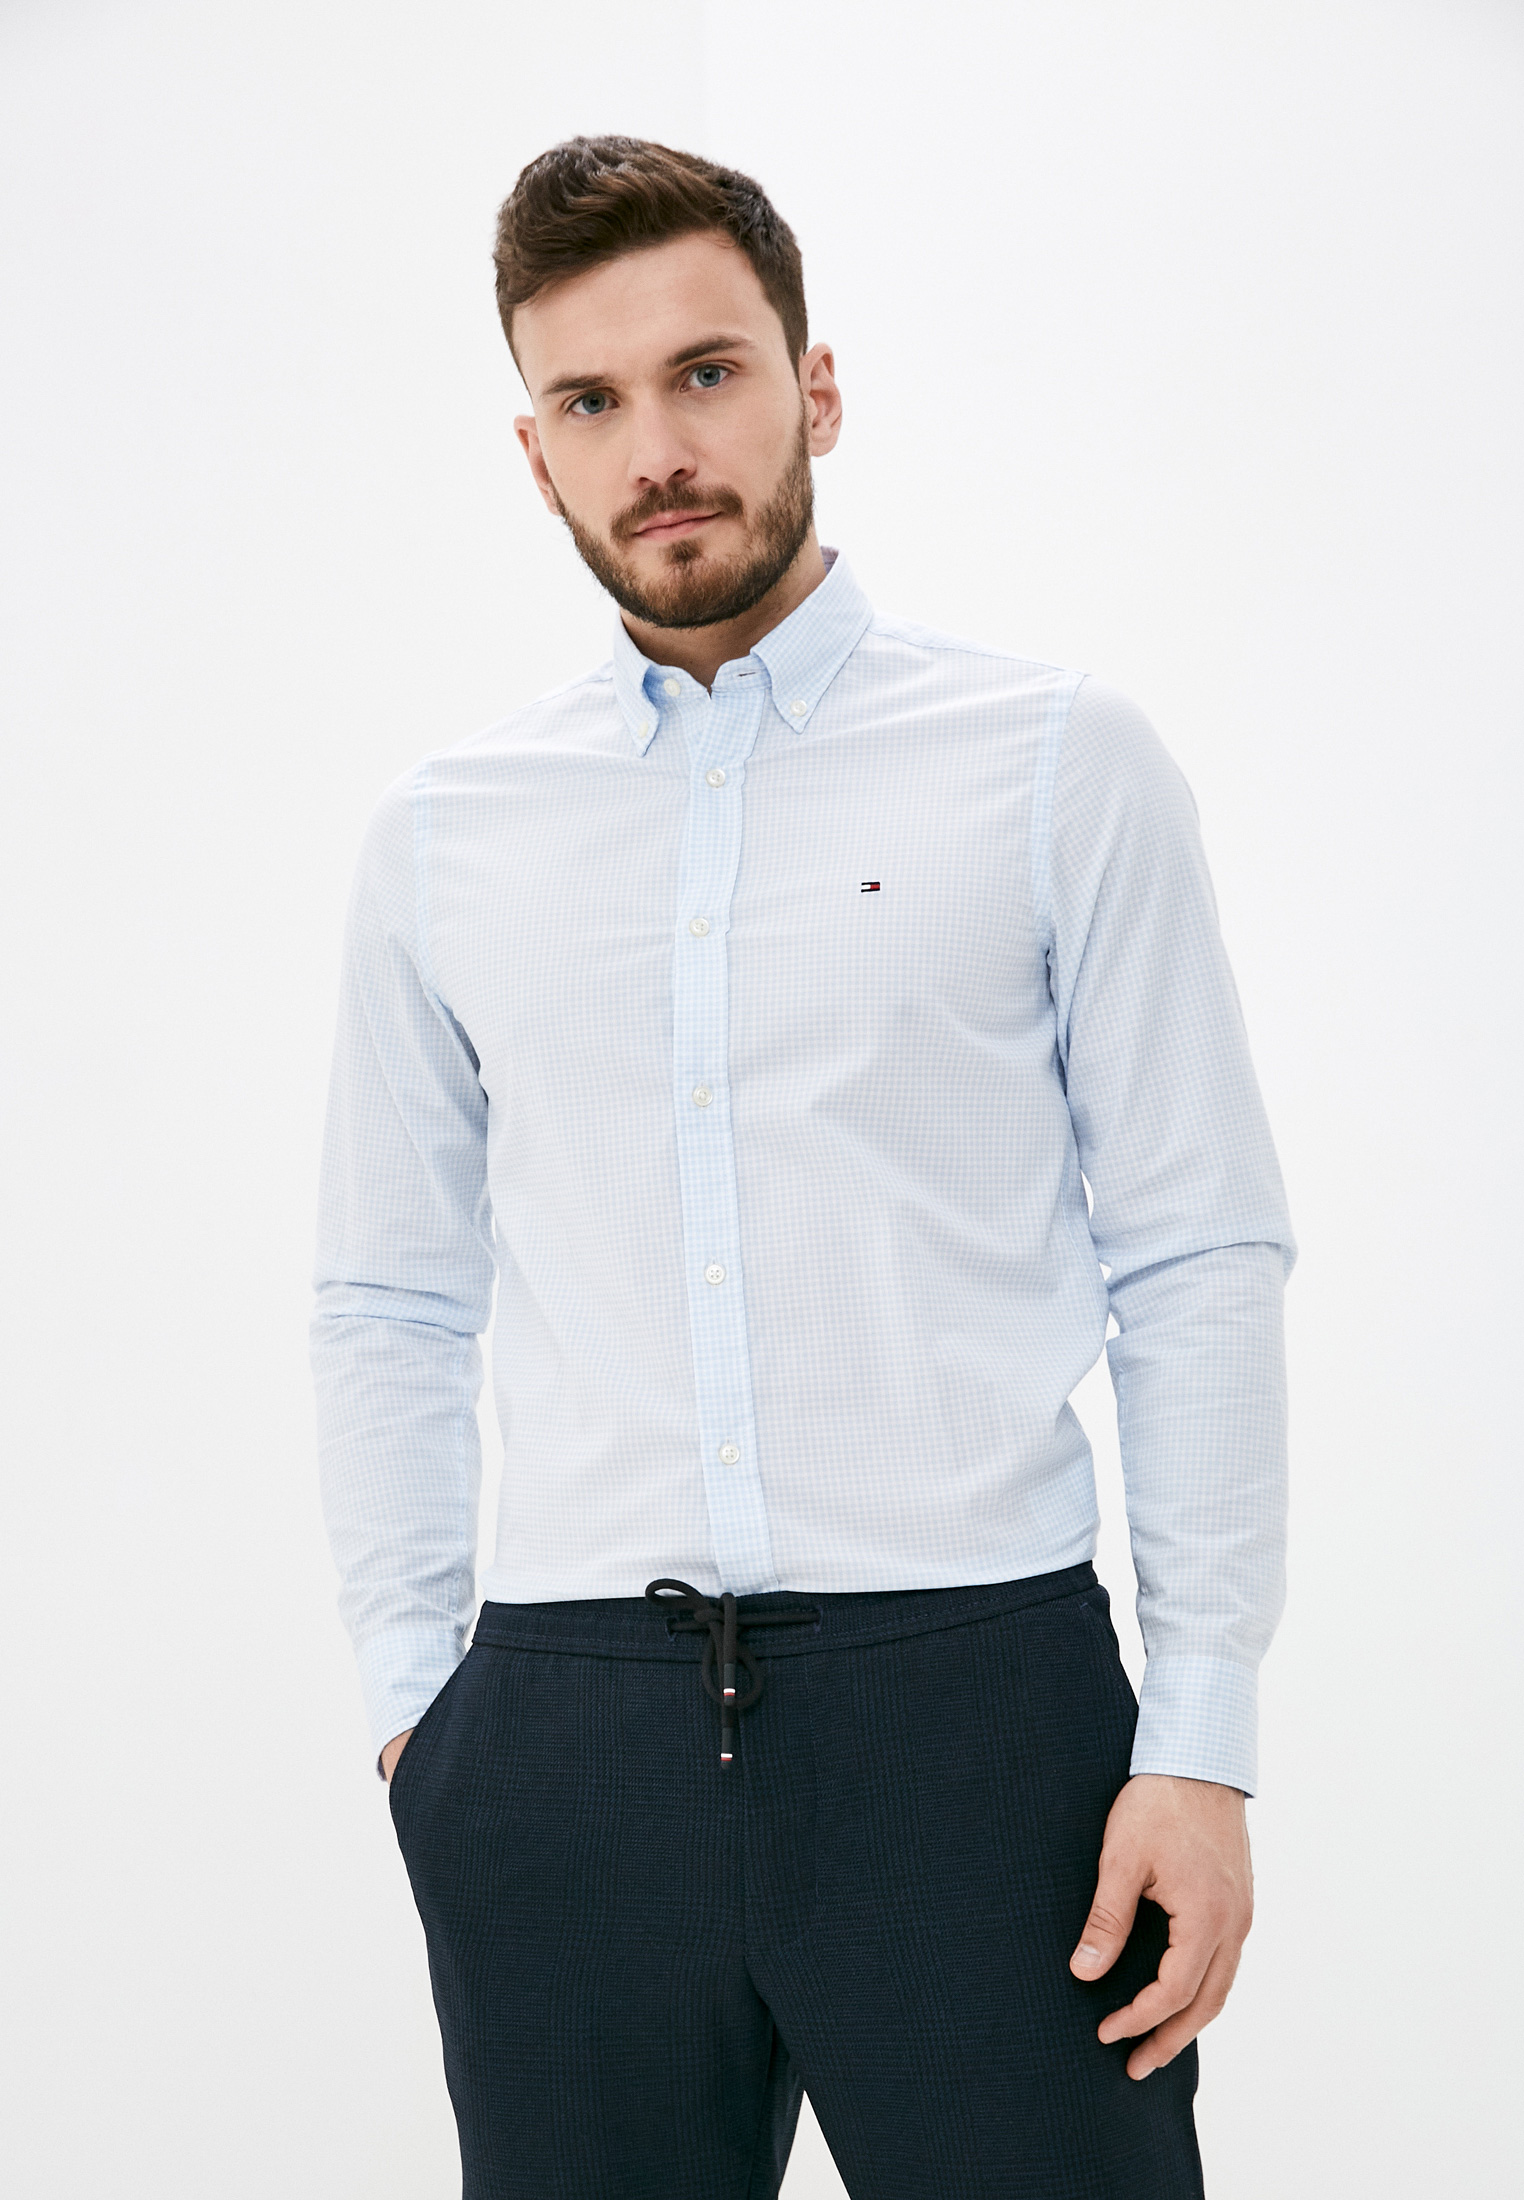 Рубашка с длинным рукавом Tommy Hilfiger (Томми Хилфигер) MW0MW18340